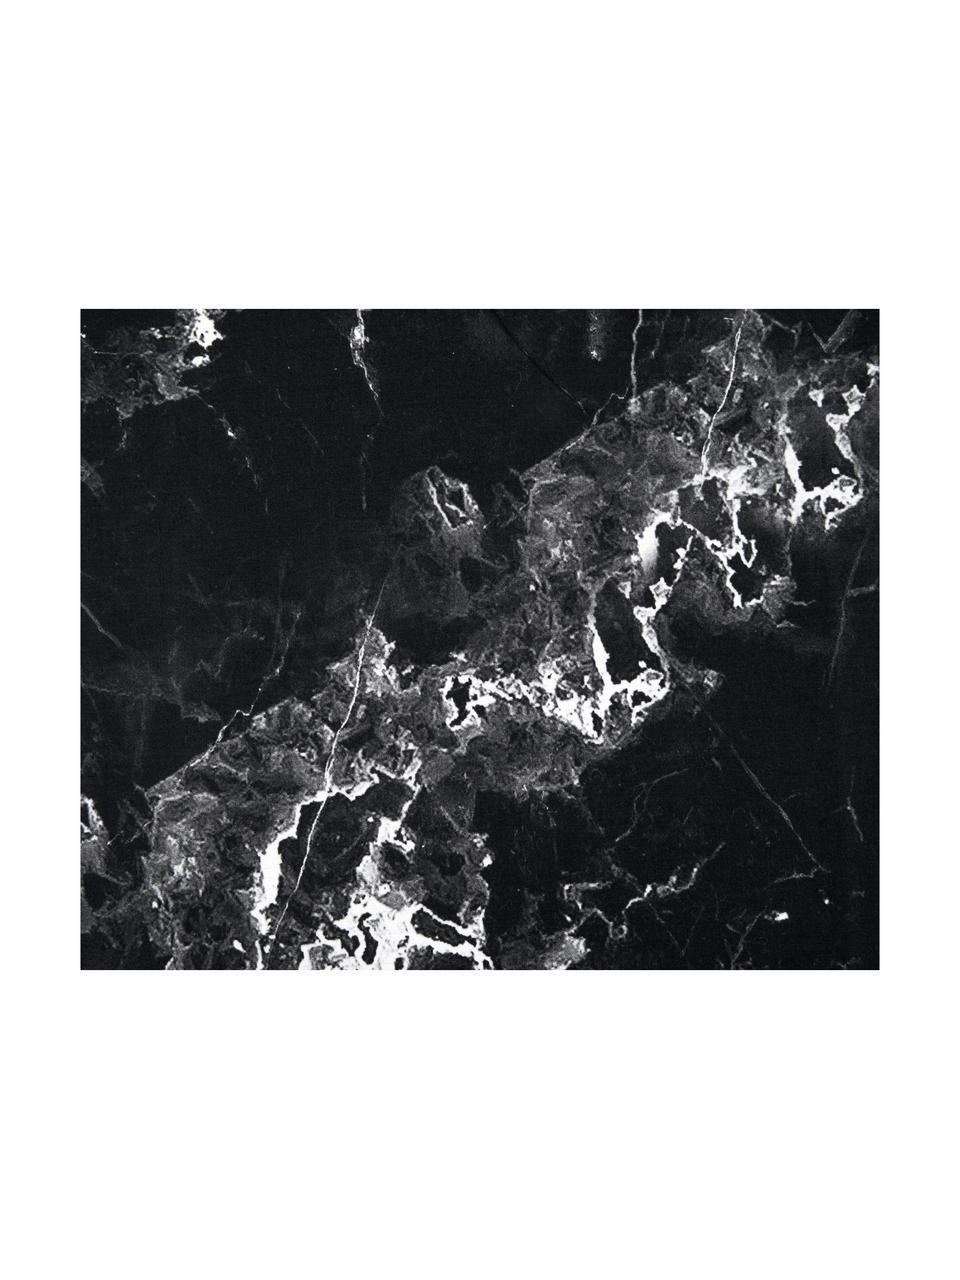 Set lenzuola reversibile effetto marmo Malin, Nero, bianco, 240 x 300 cm + 2 federe 50 x 80 cm